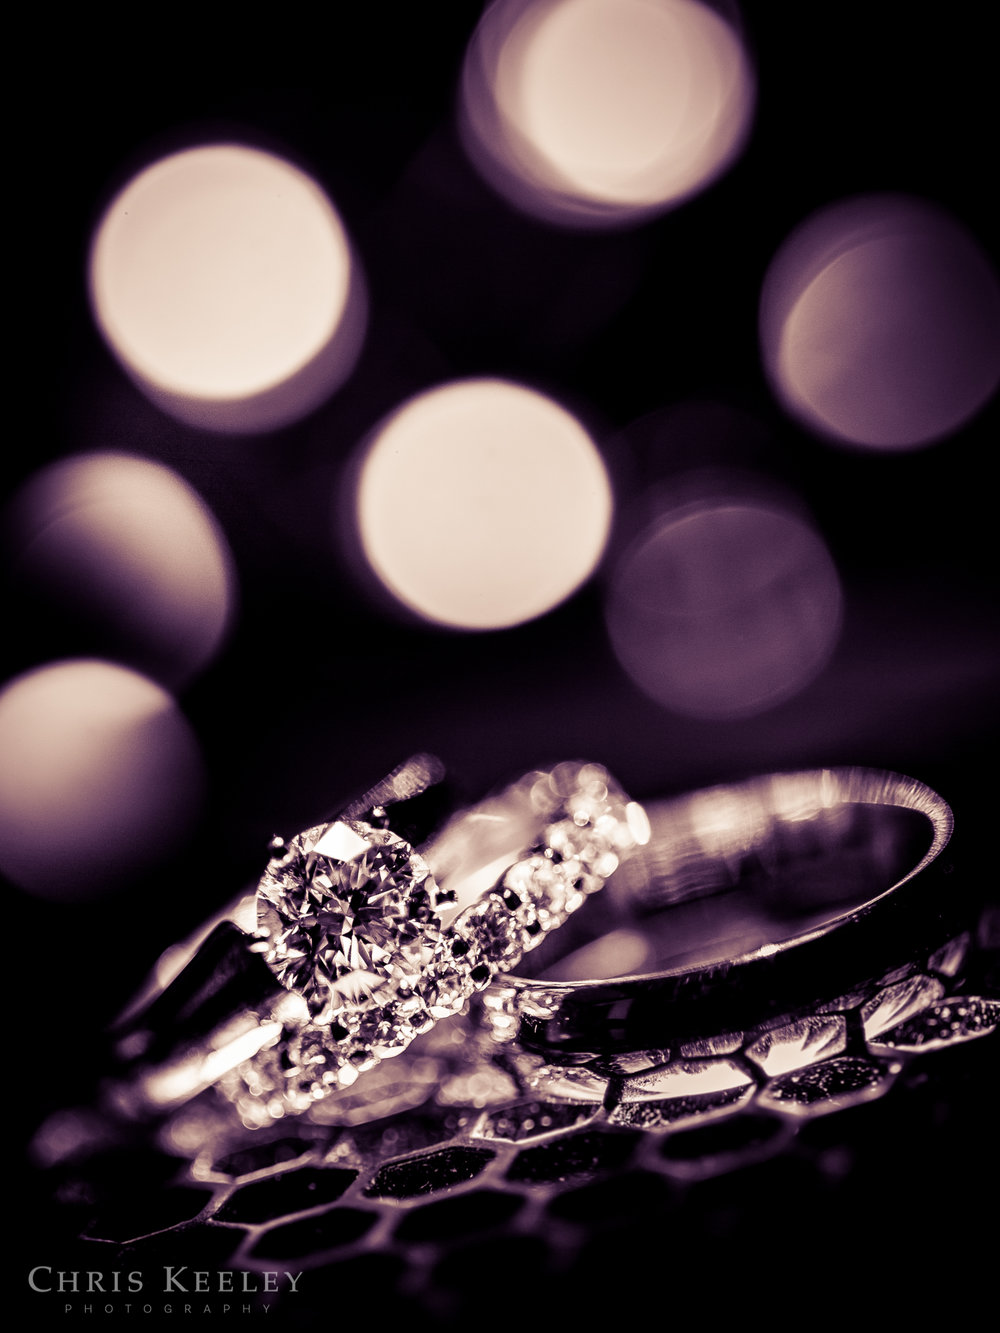 dover-new-hampshire-wedding-photographer-seacoast-chris-keeley-photography-05.jpg